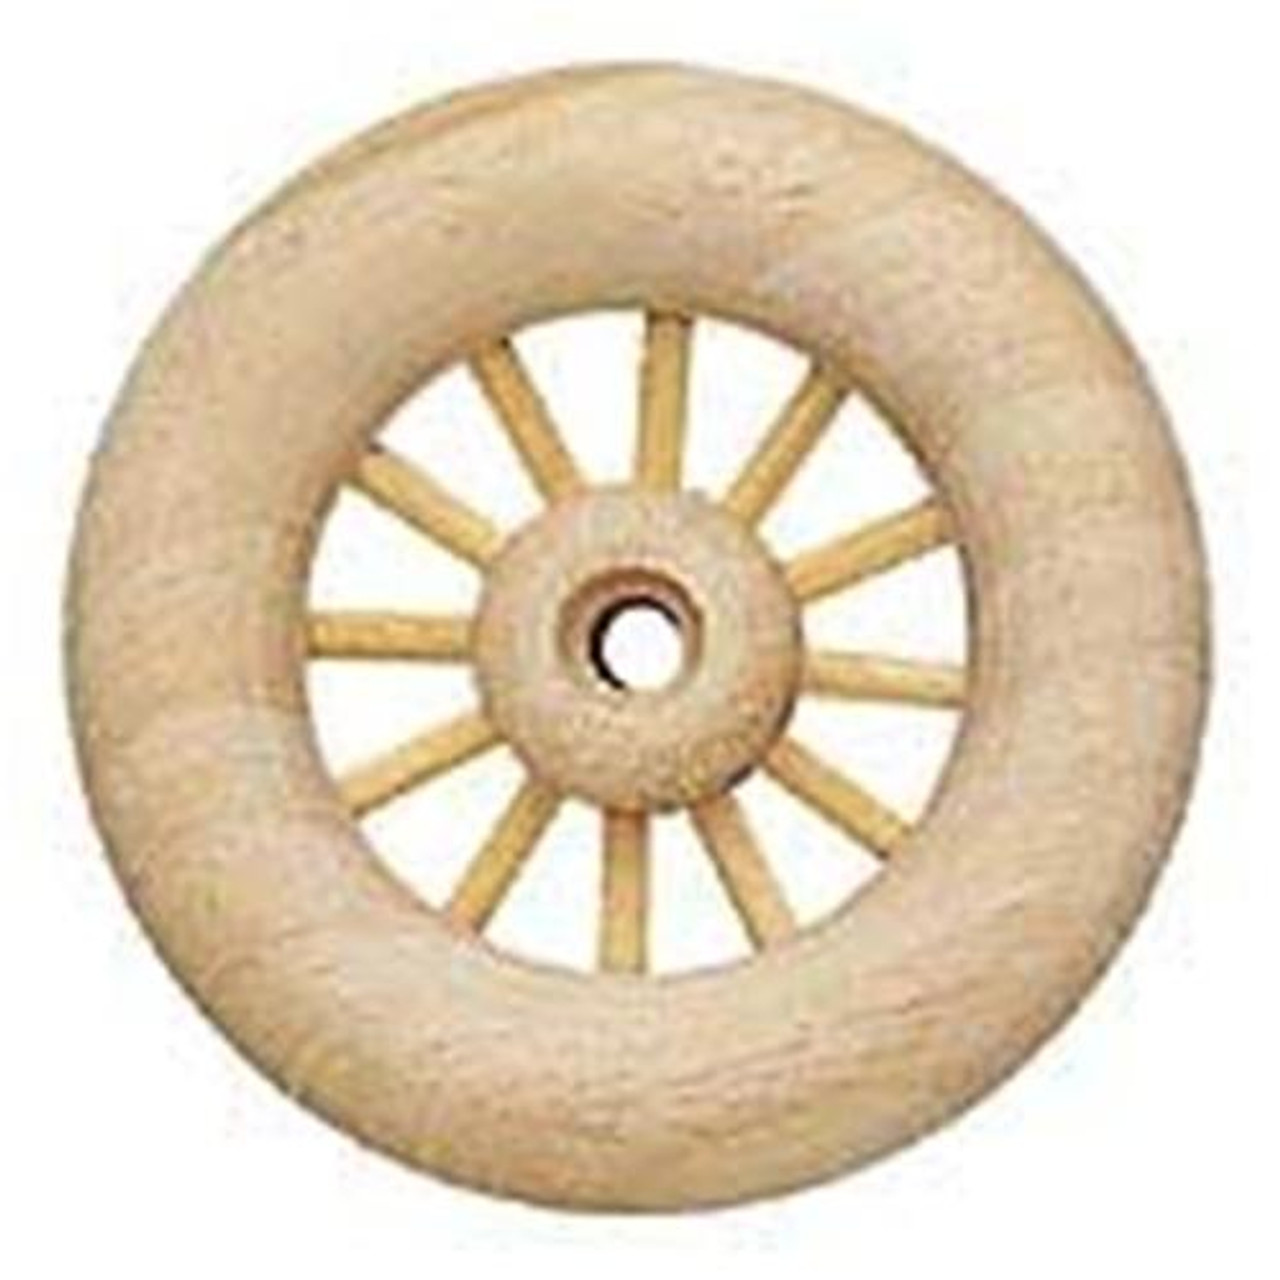 Cherry Tree Toys 3 1/2 Spoked Wooden Toy Wheels